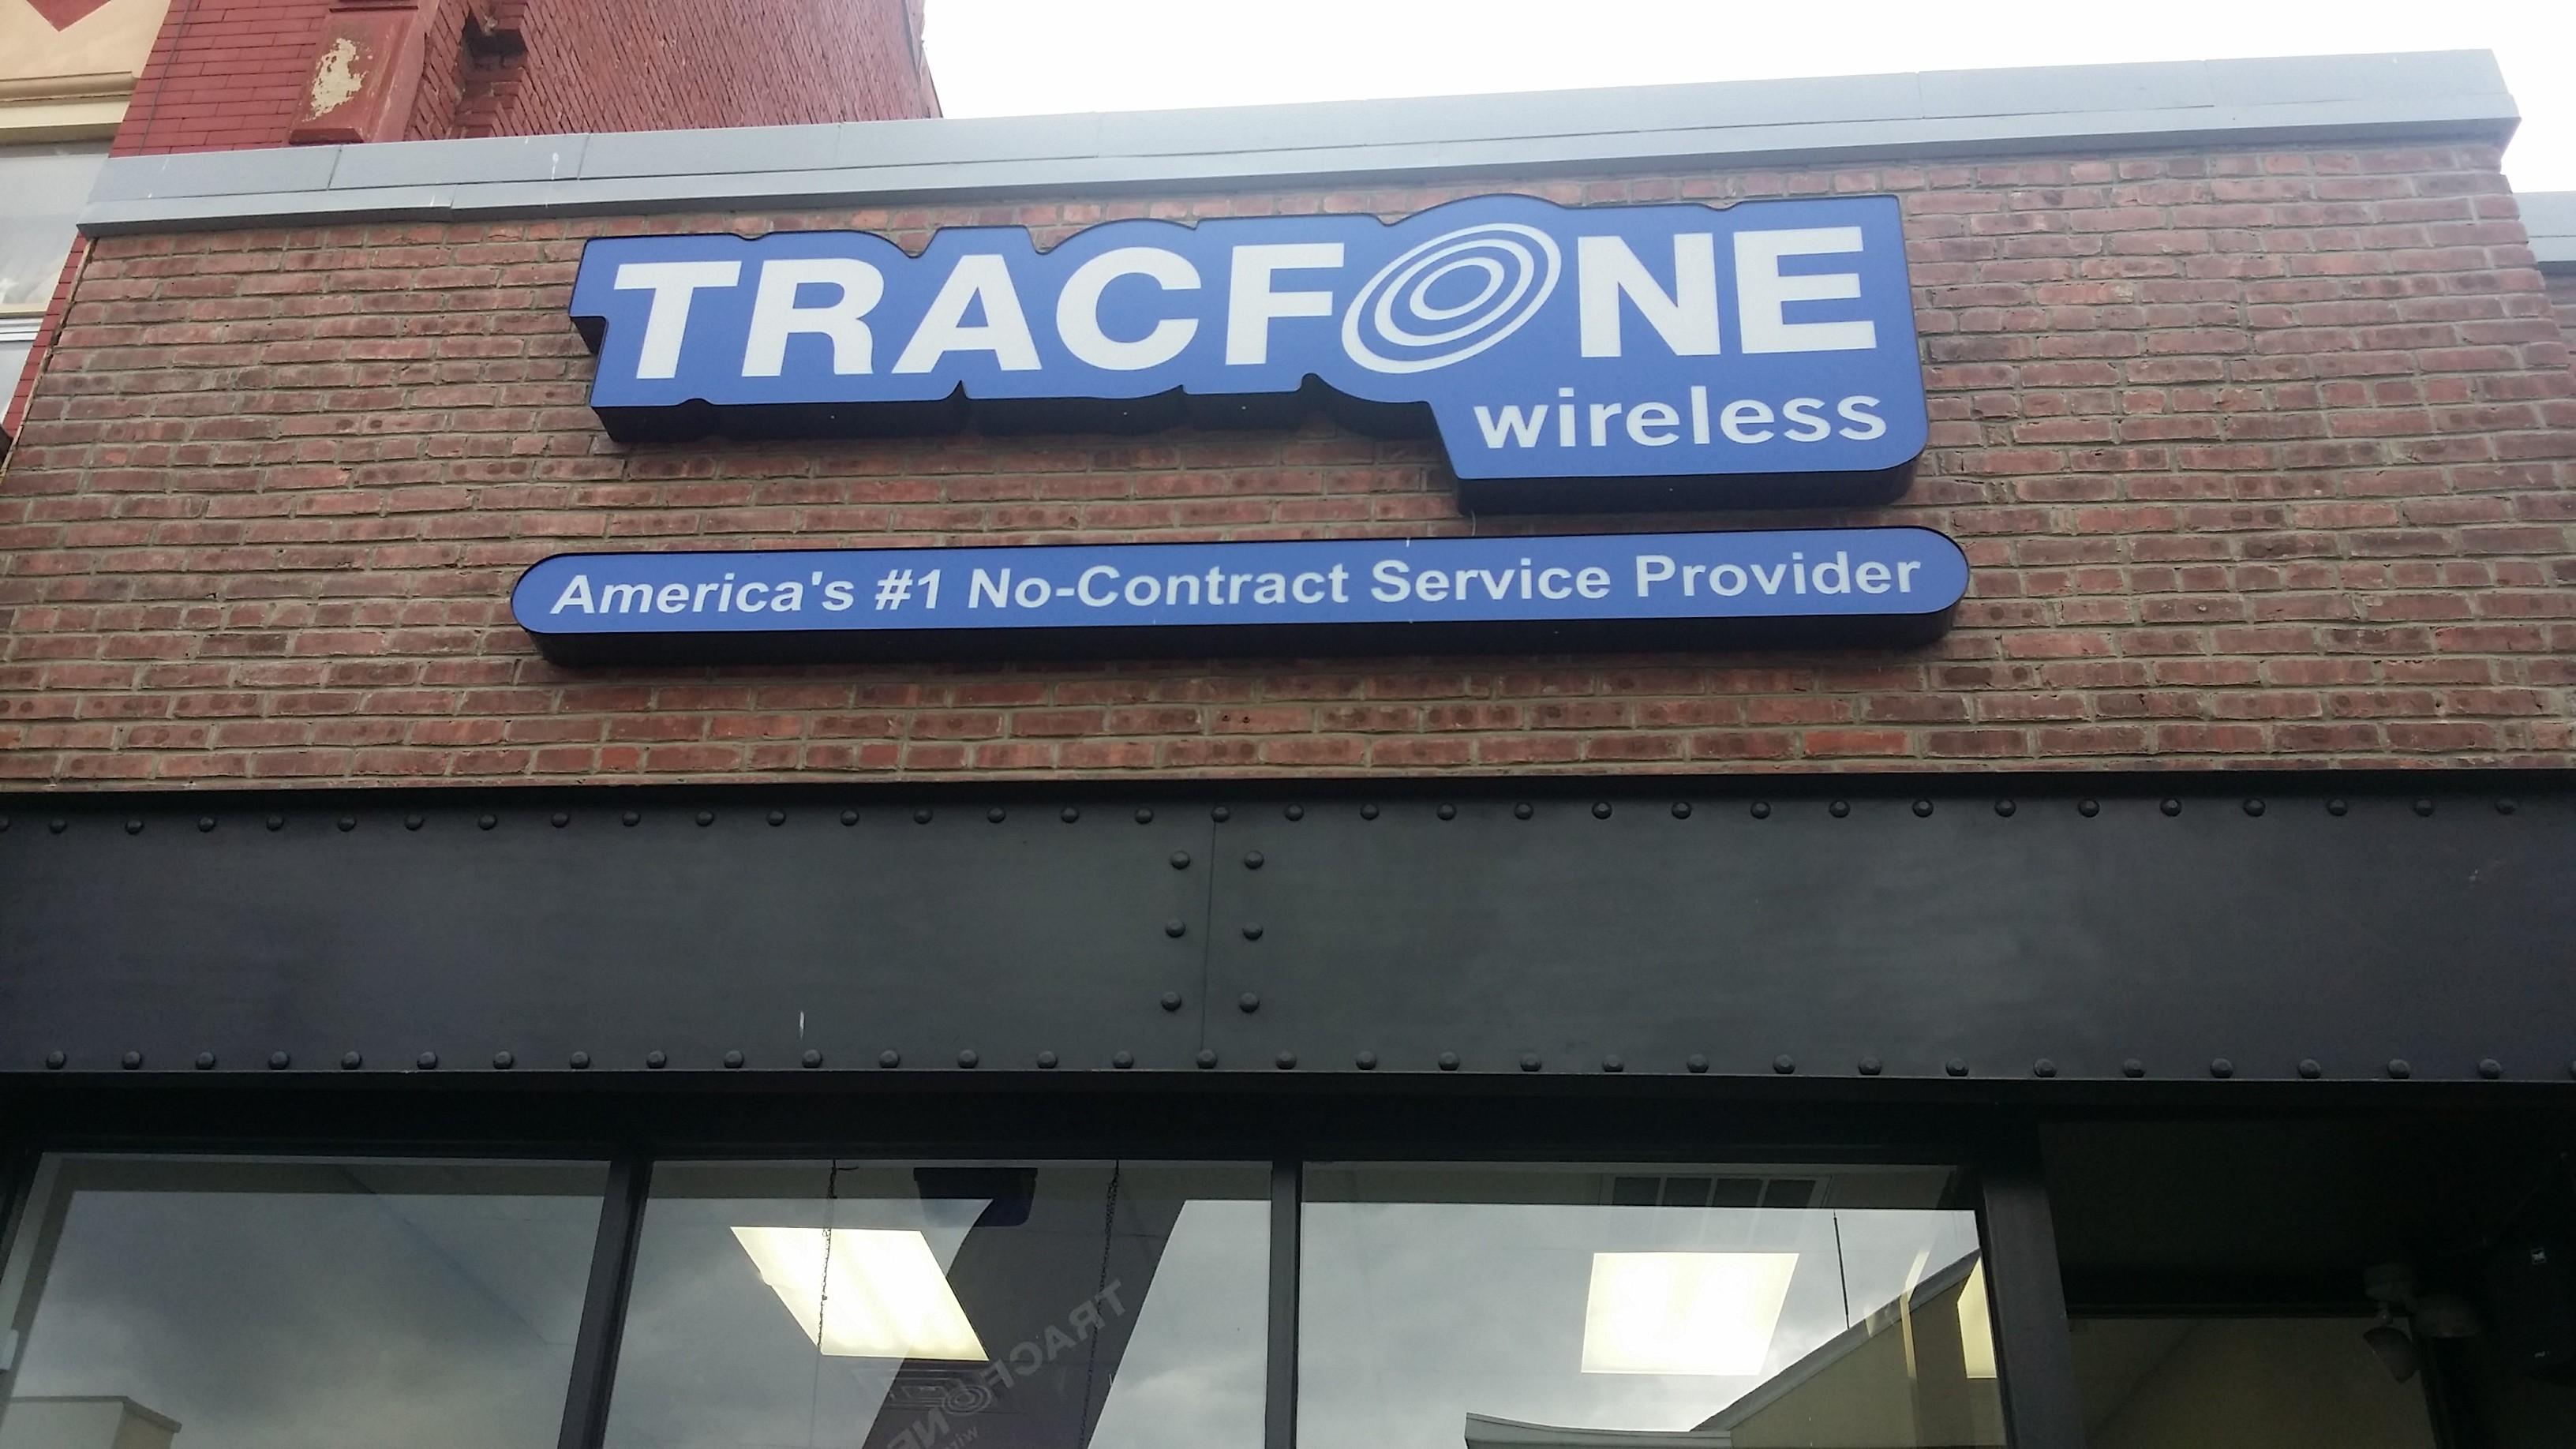 TracFone Wireless Dba VARP Wireless LLC | LinkedIn